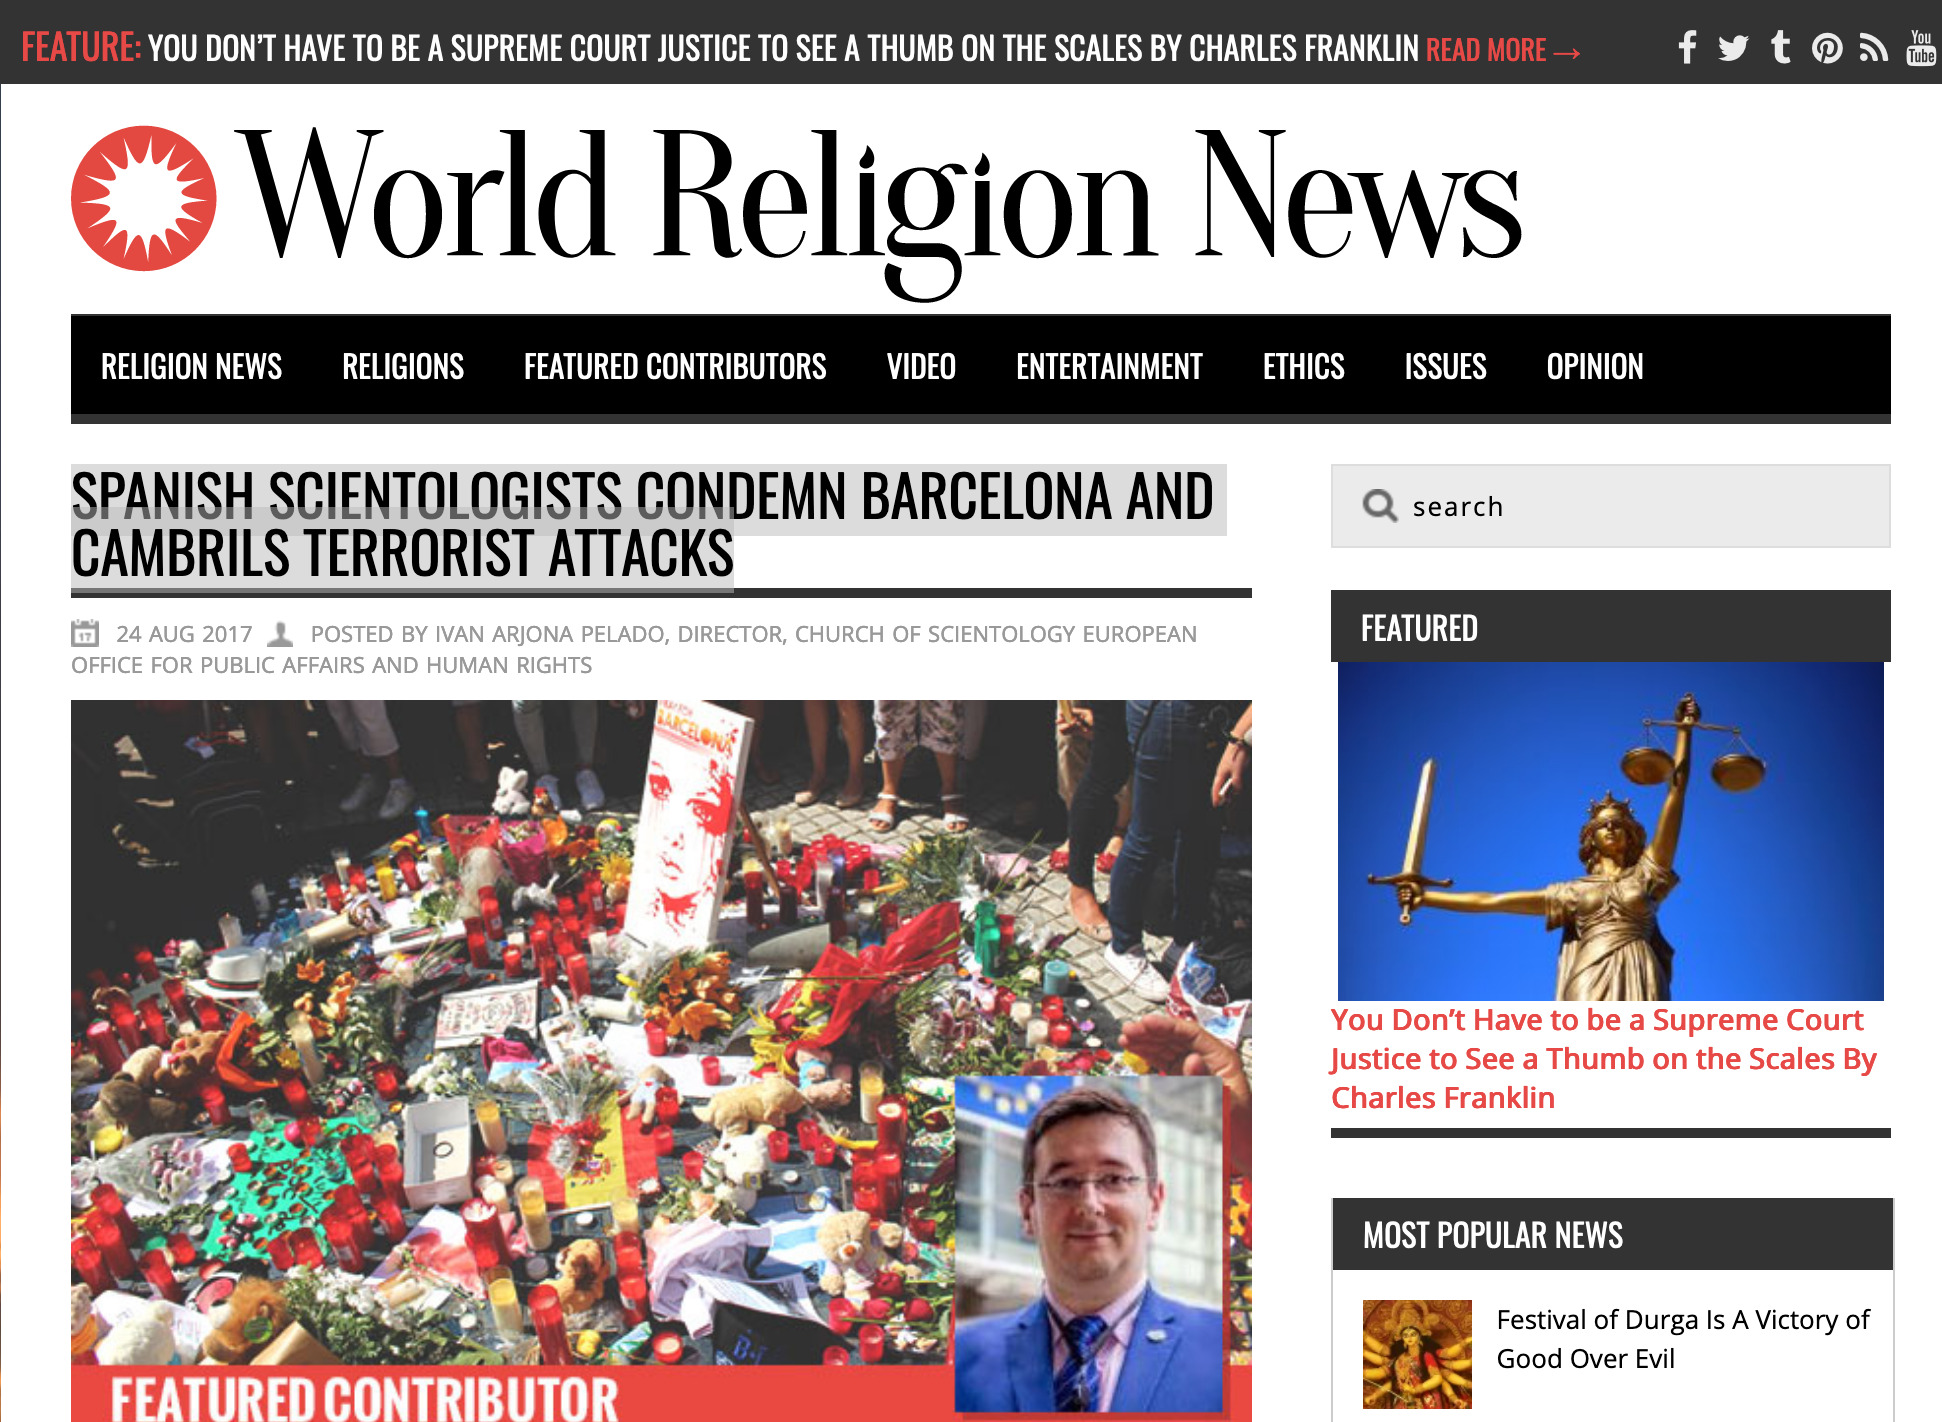 Spanish Scientologists Condemn Barcelona and Cambrils Terrorist Attacks - World Religion News